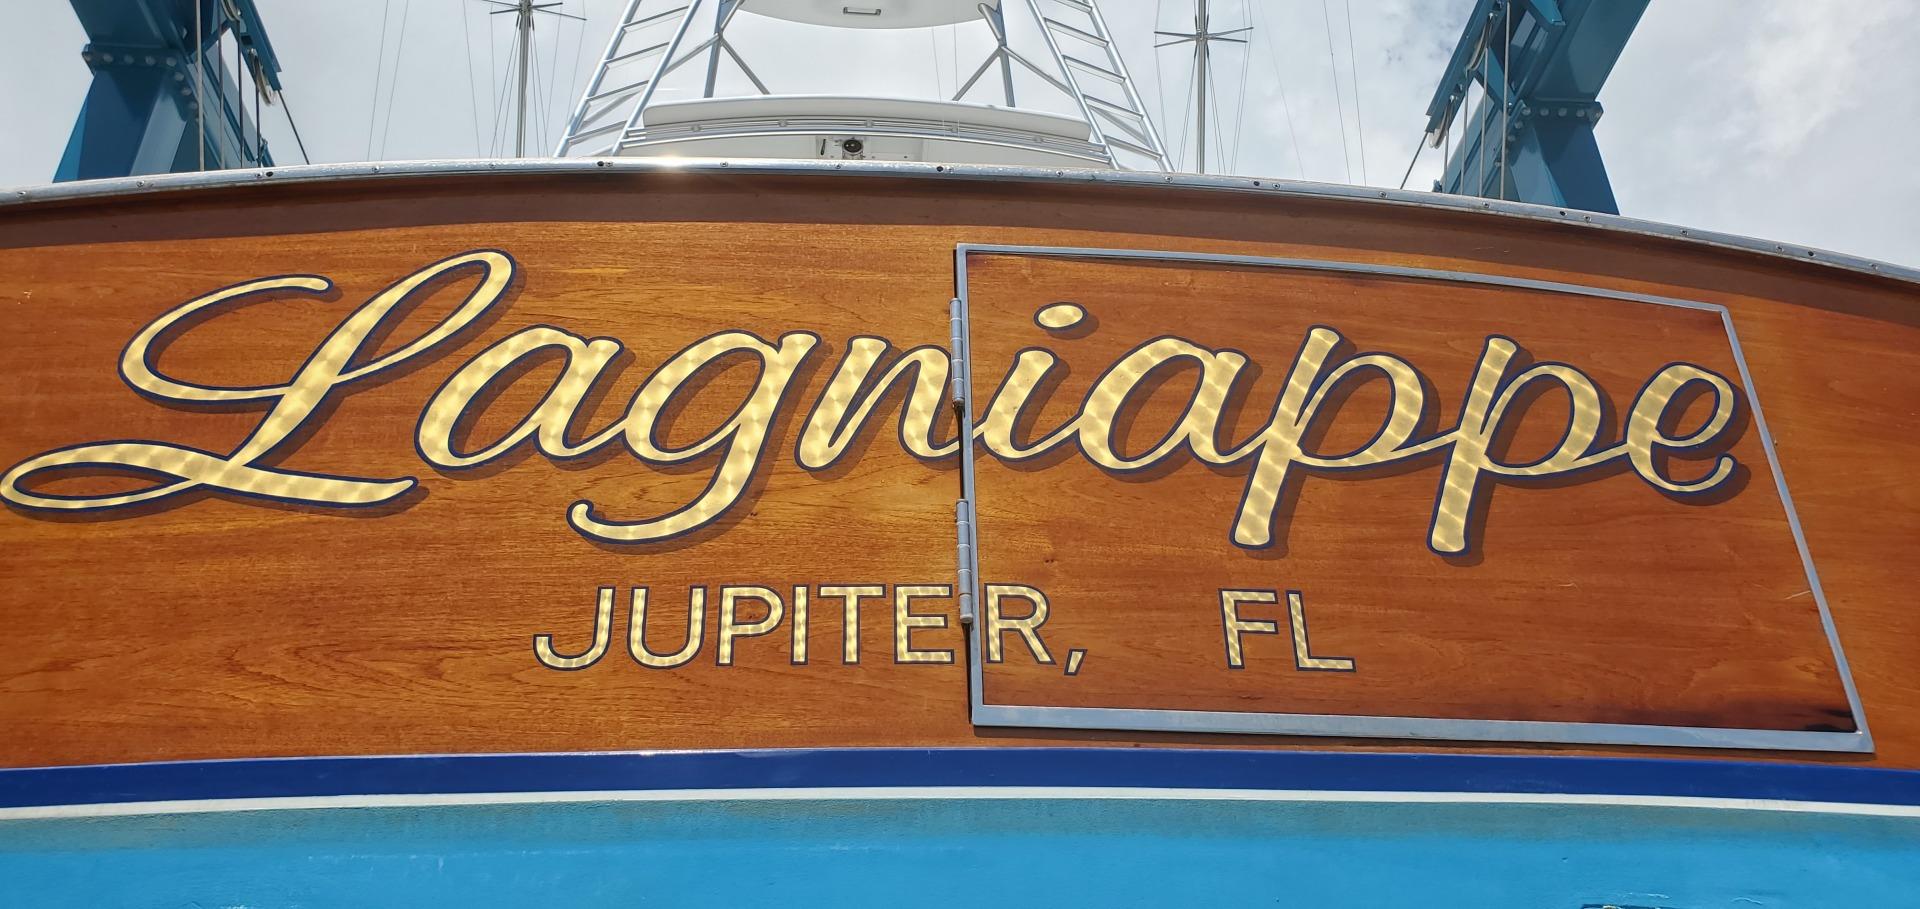 Merritt-Custom 1977-Lagniappe Jupiter-Florida-United States-1554032 | Thumbnail